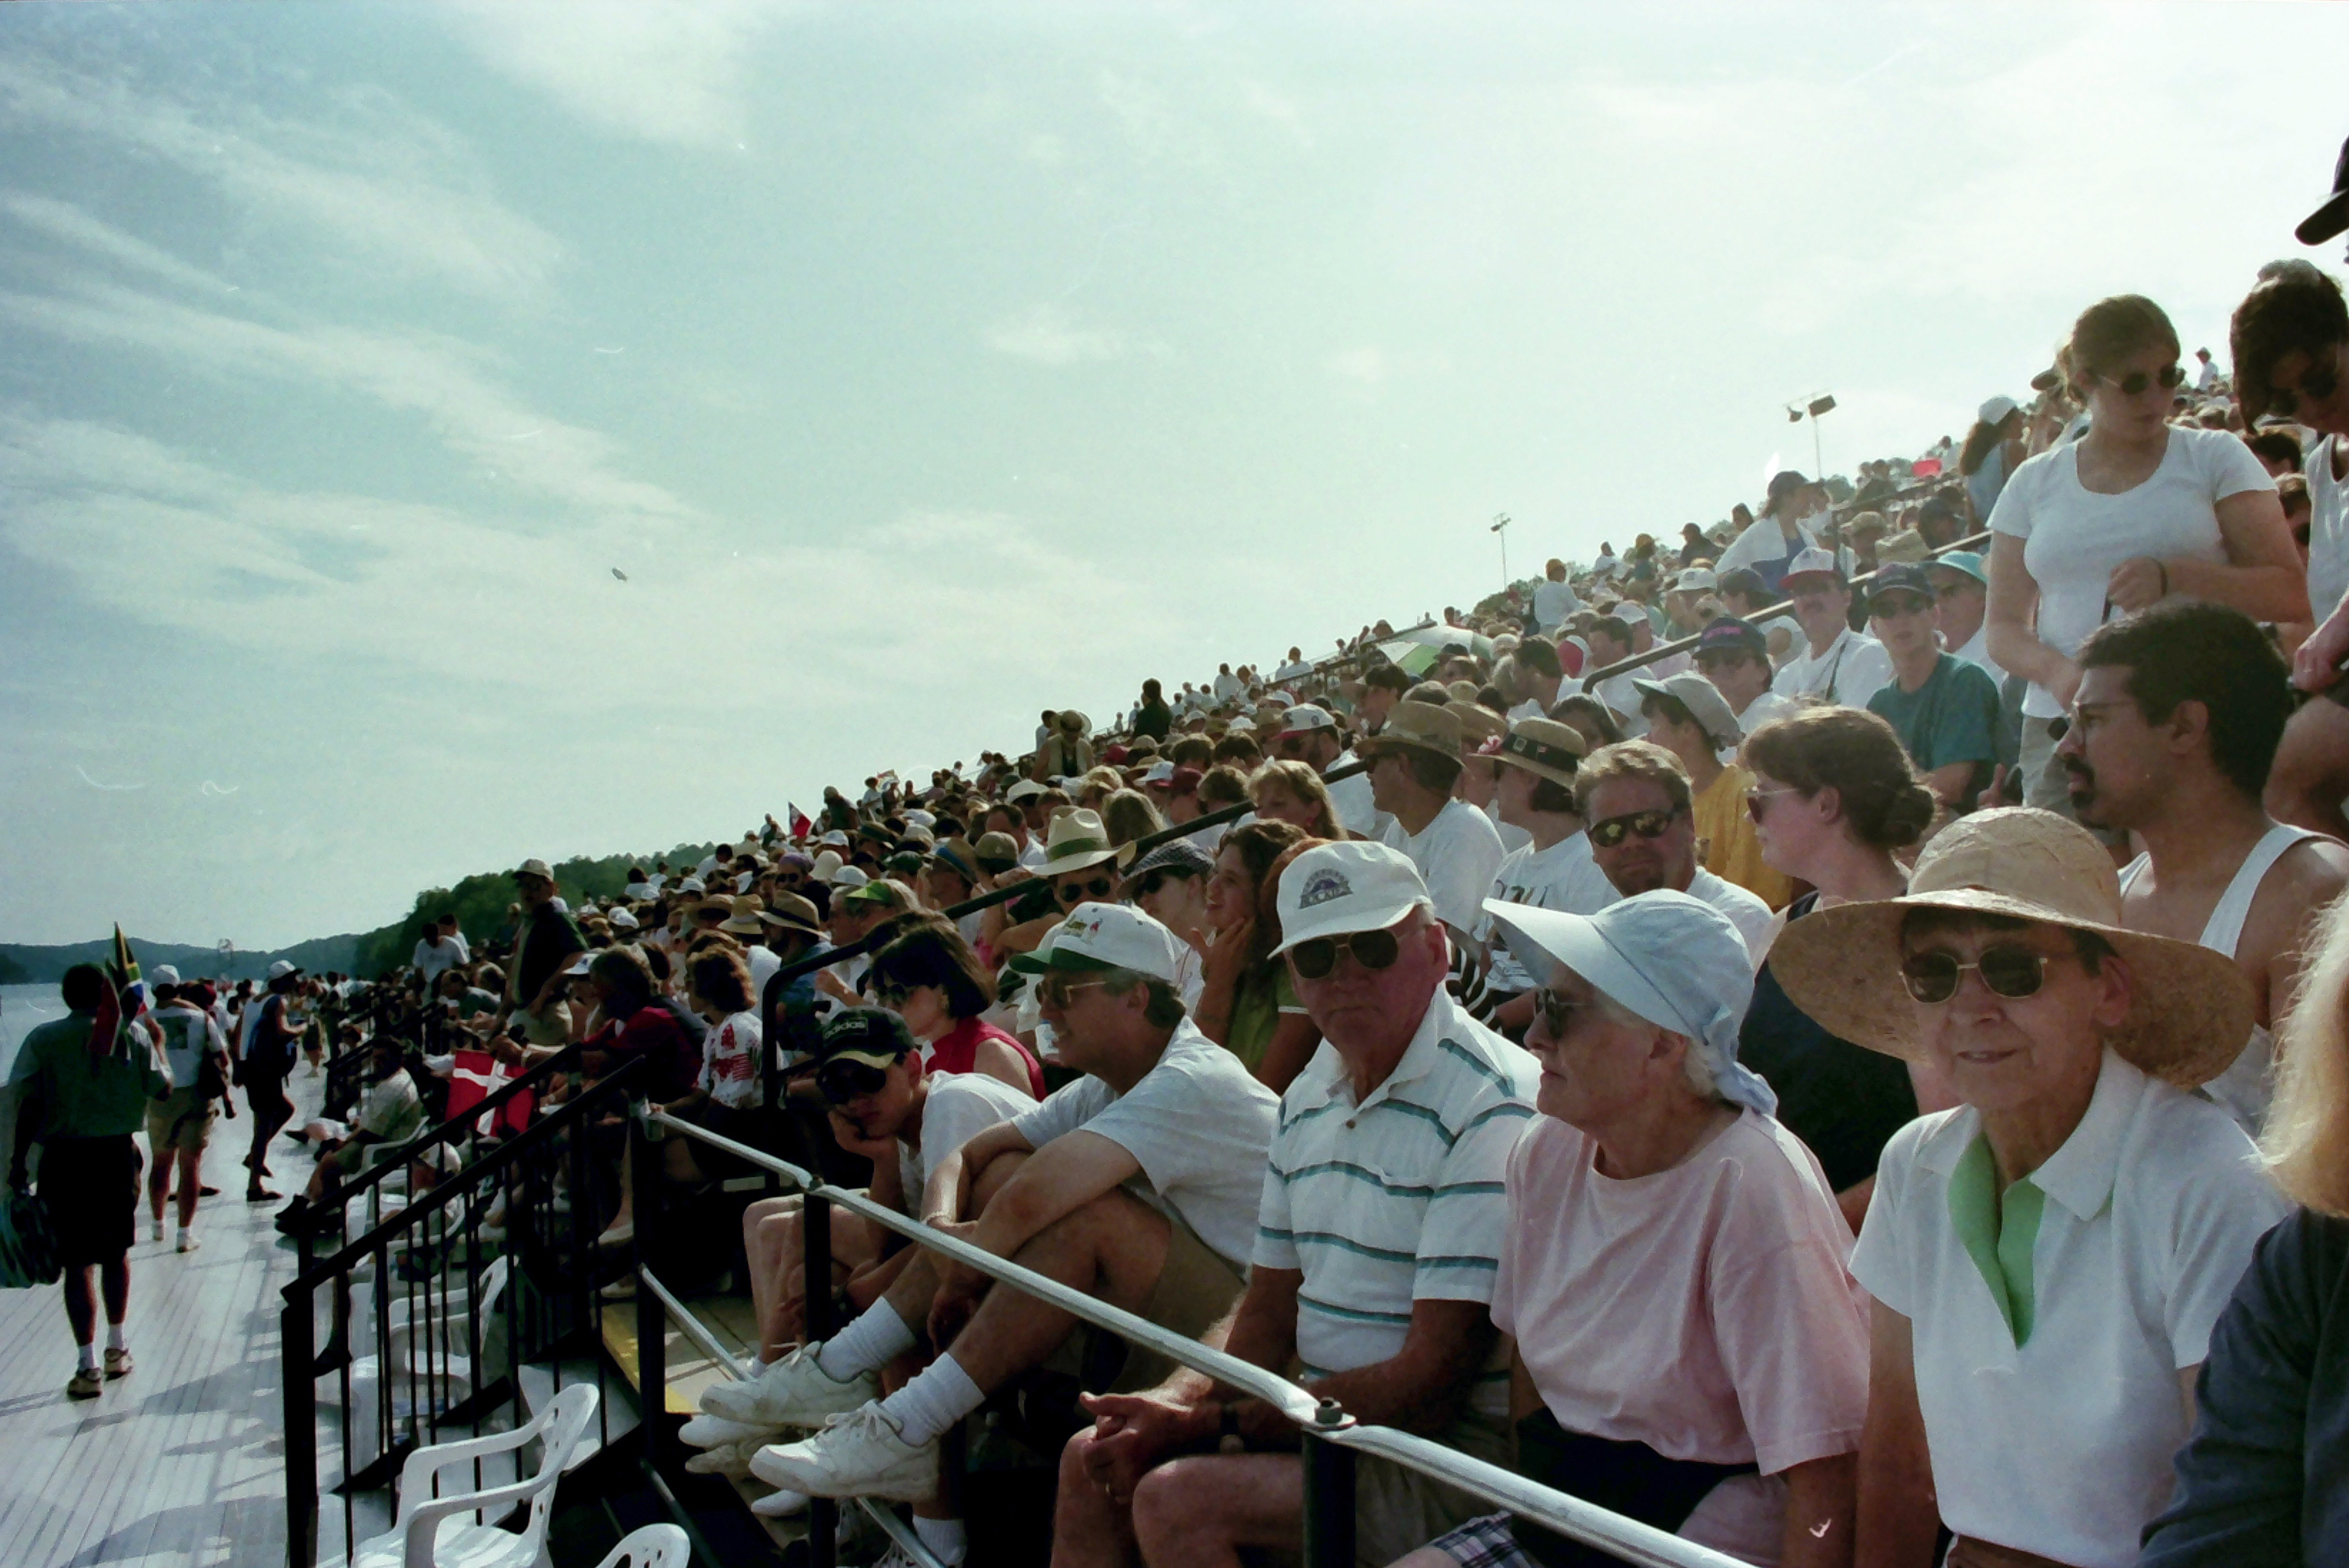 1996 crowd 1.jpg